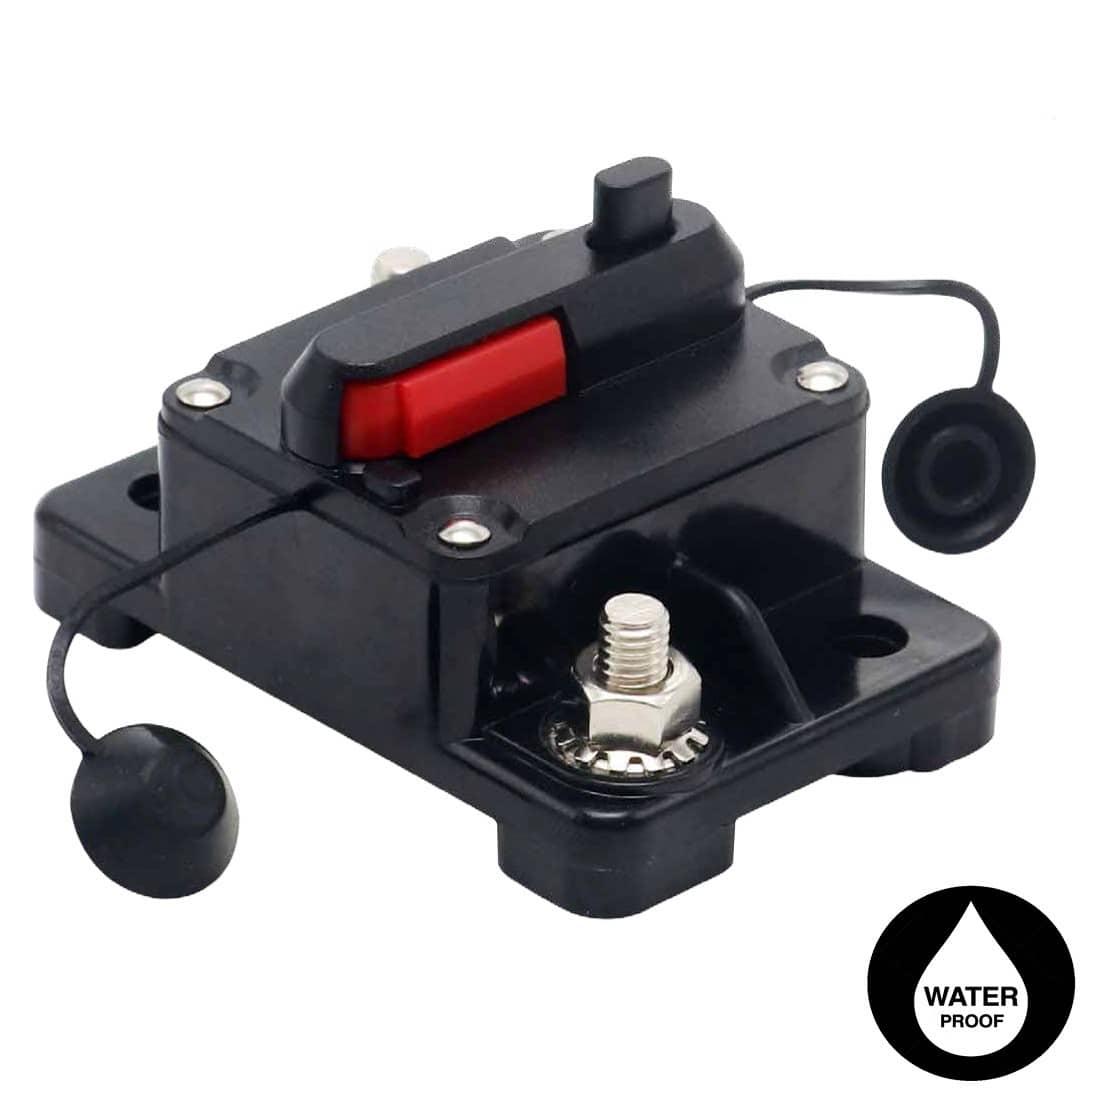 AMPIRE-Sicherungsautomat